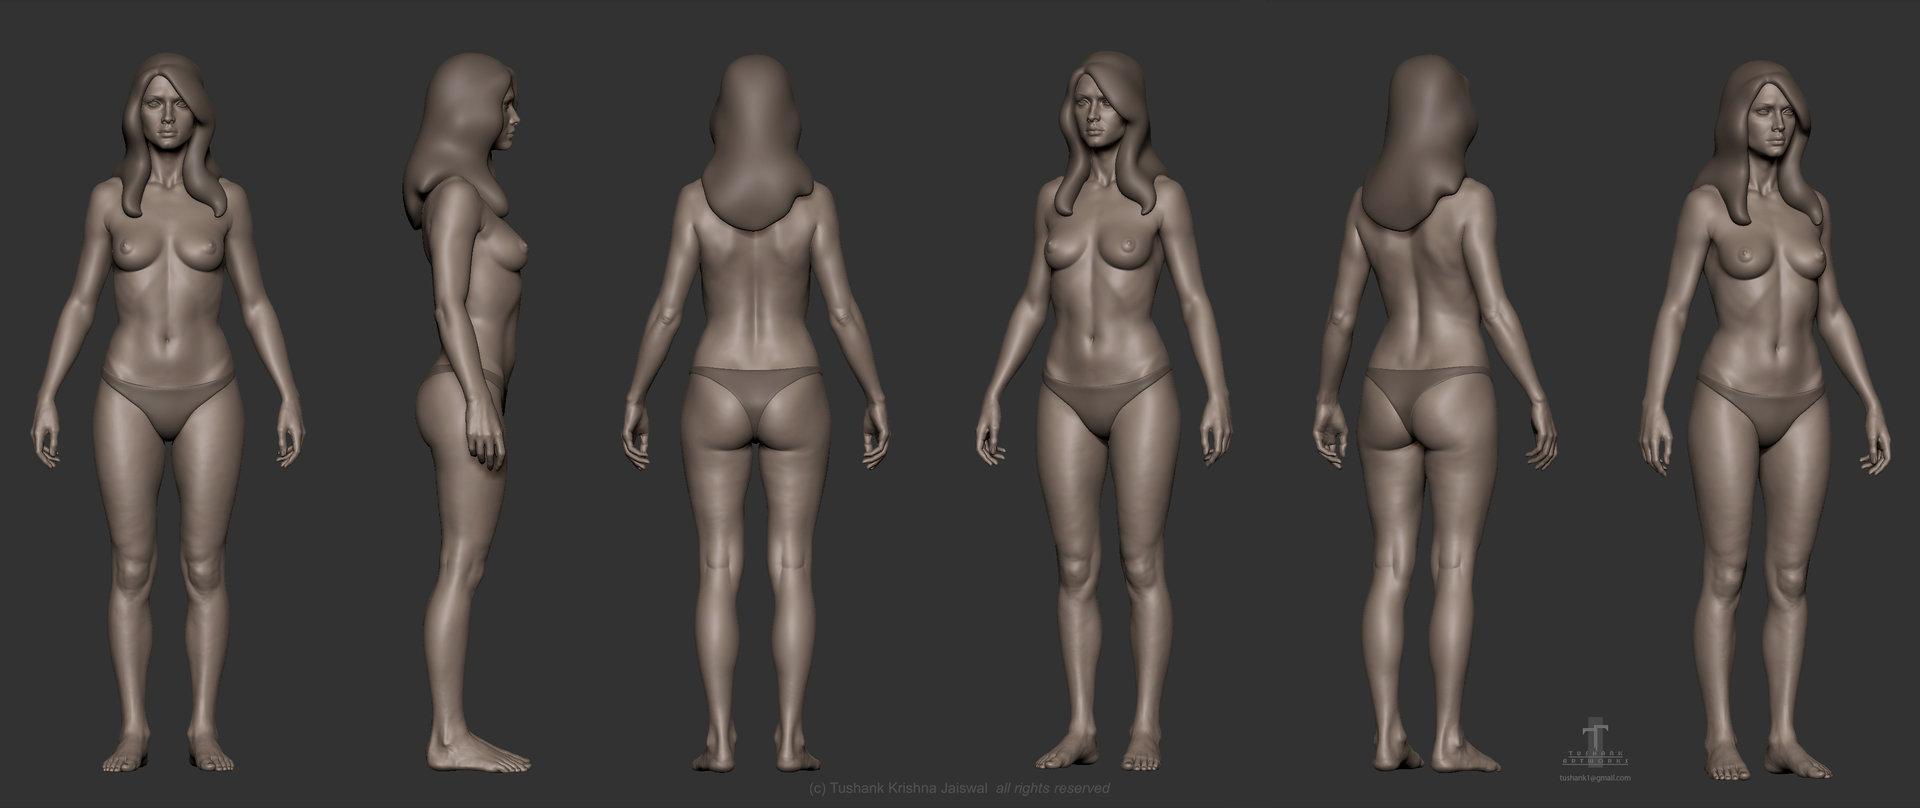 Tushank k jaiswal anatomy study female 2a